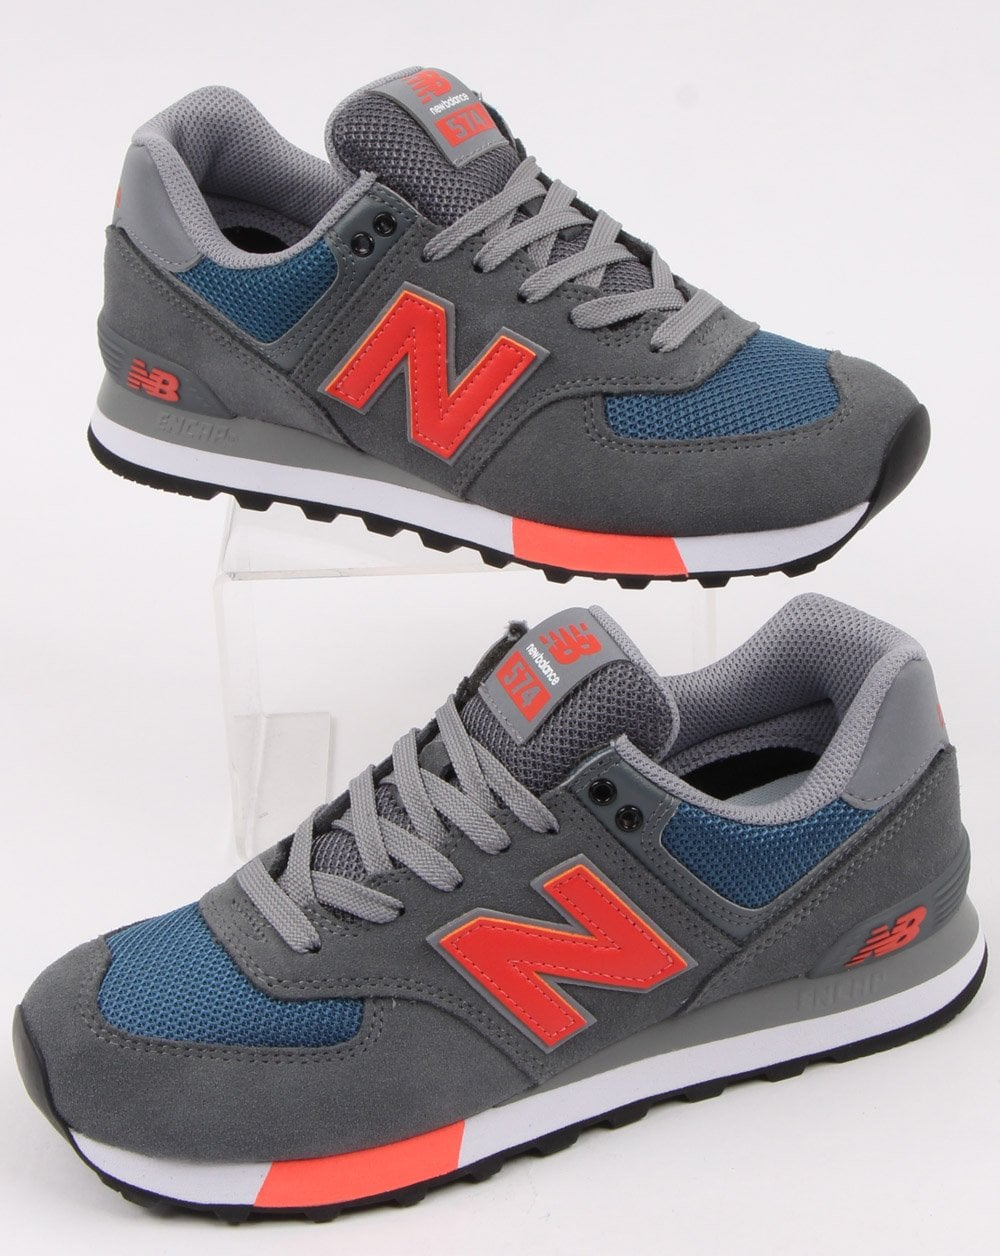 New Balance 574 Trainers Grey/Orange